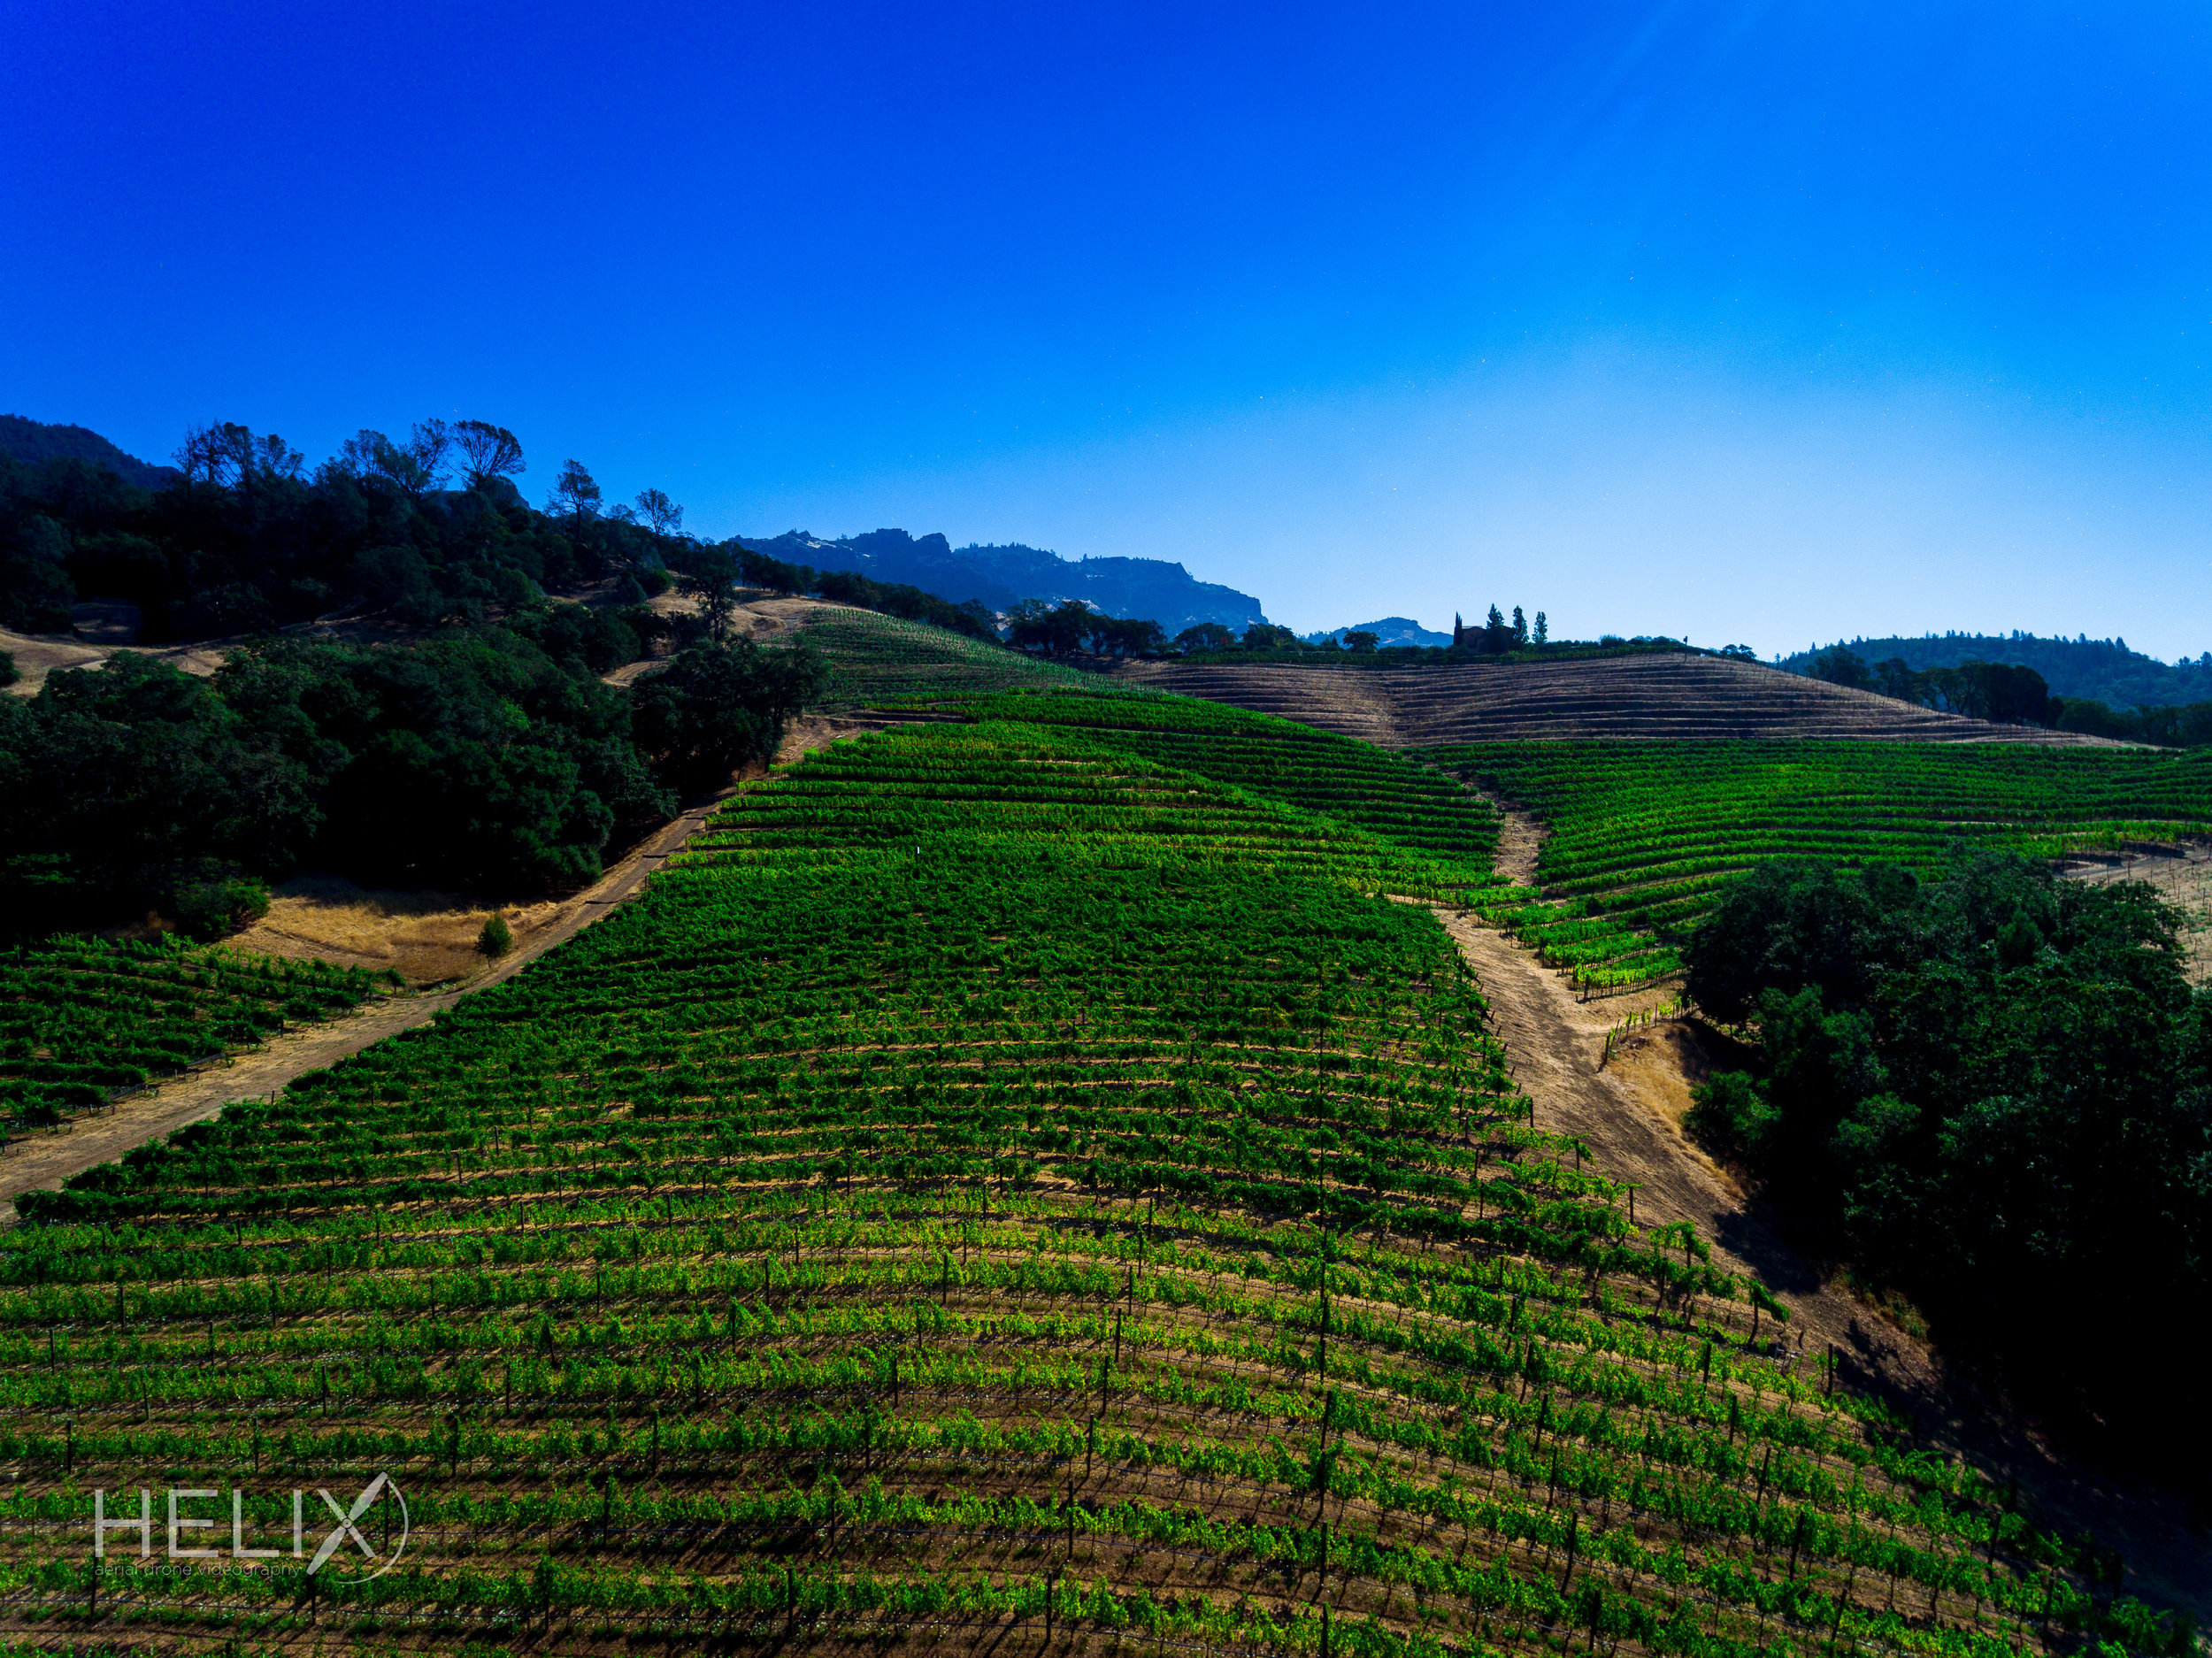 HELIX - Jerico Canyon Winery 090516-8.jpg